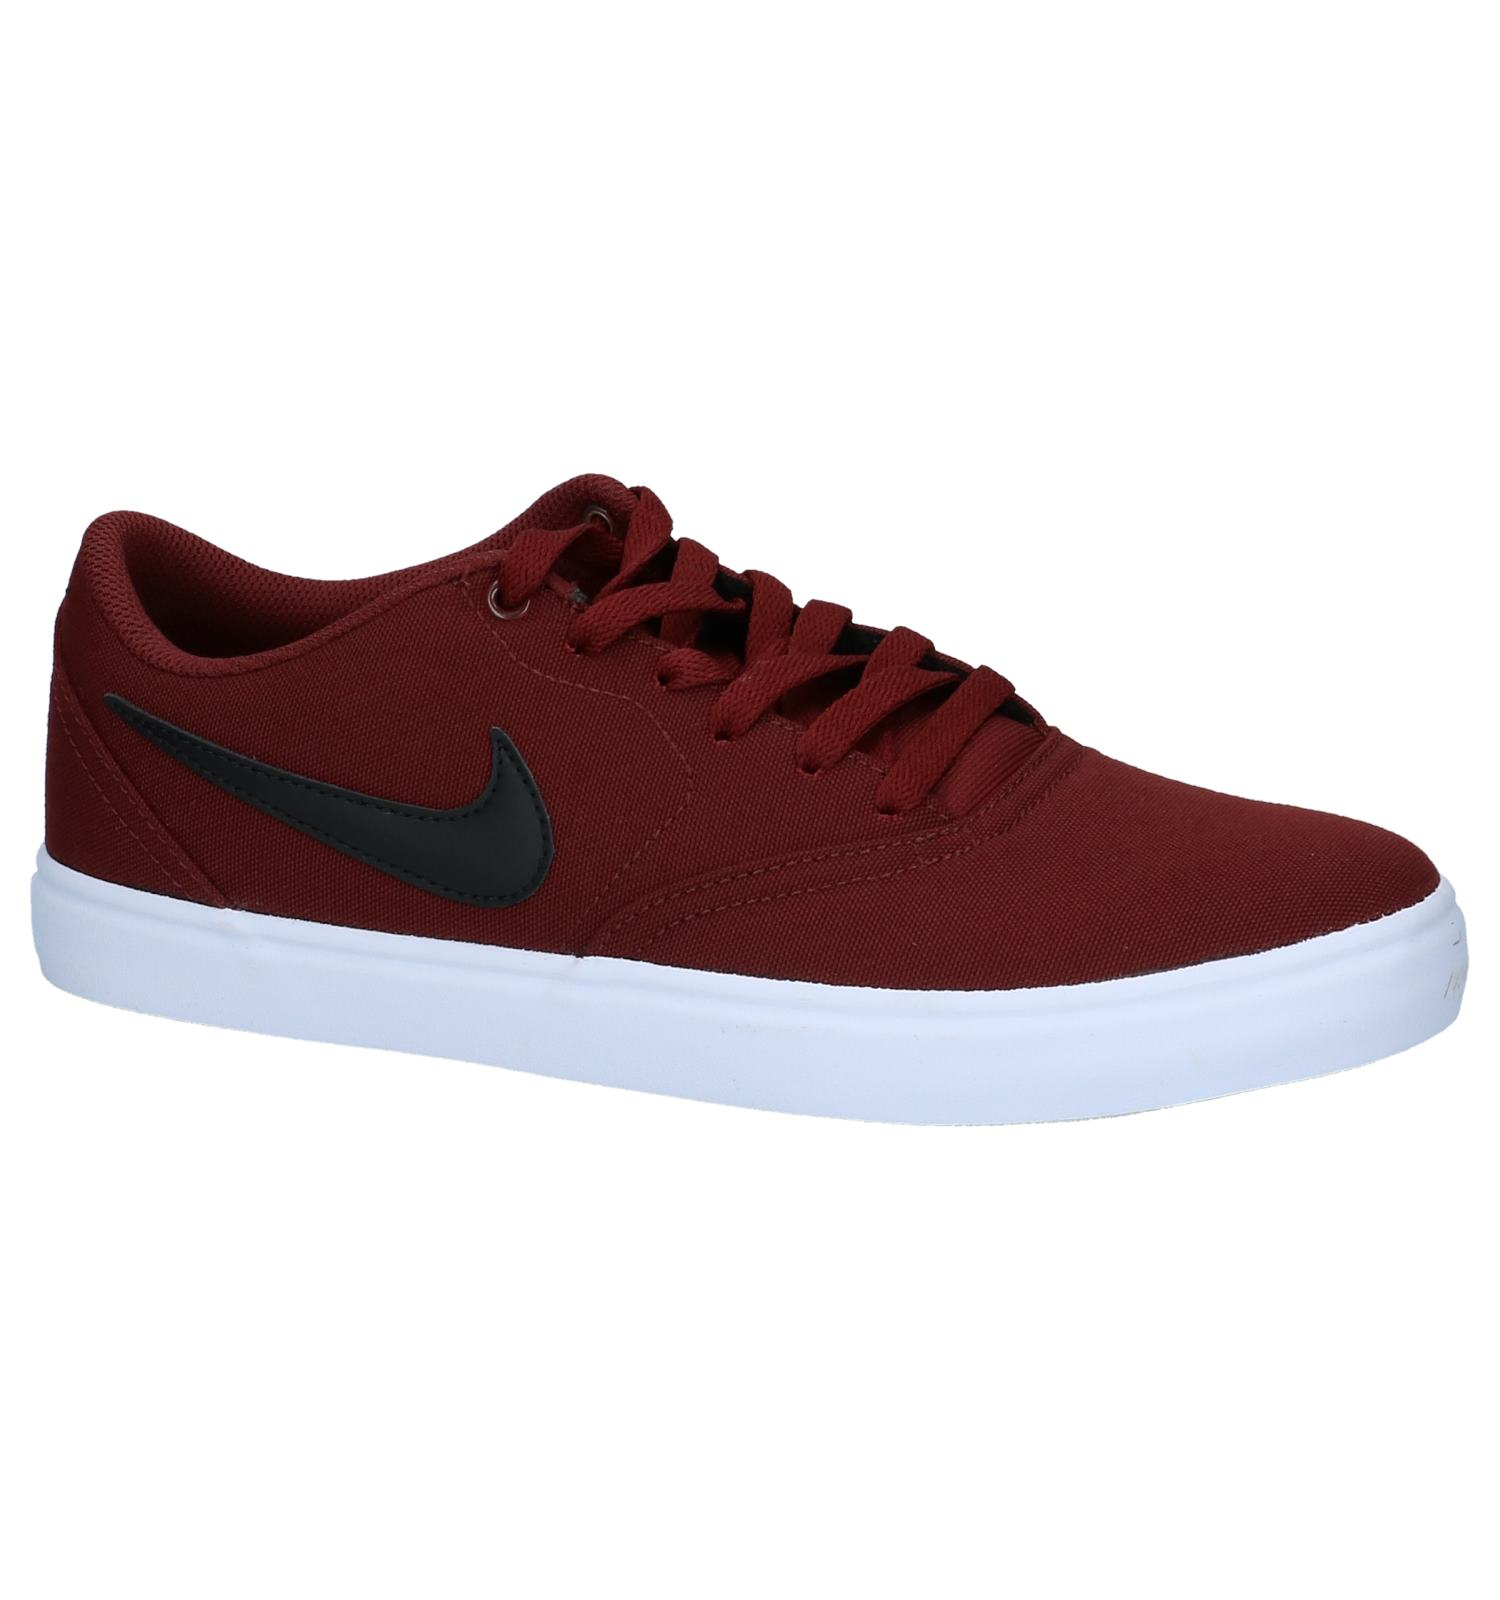 premium selection 1a1df 1a120 Nike SB Check Solar Bordeaux Sneakers  TORFS.BE  Gratis verzend en retour